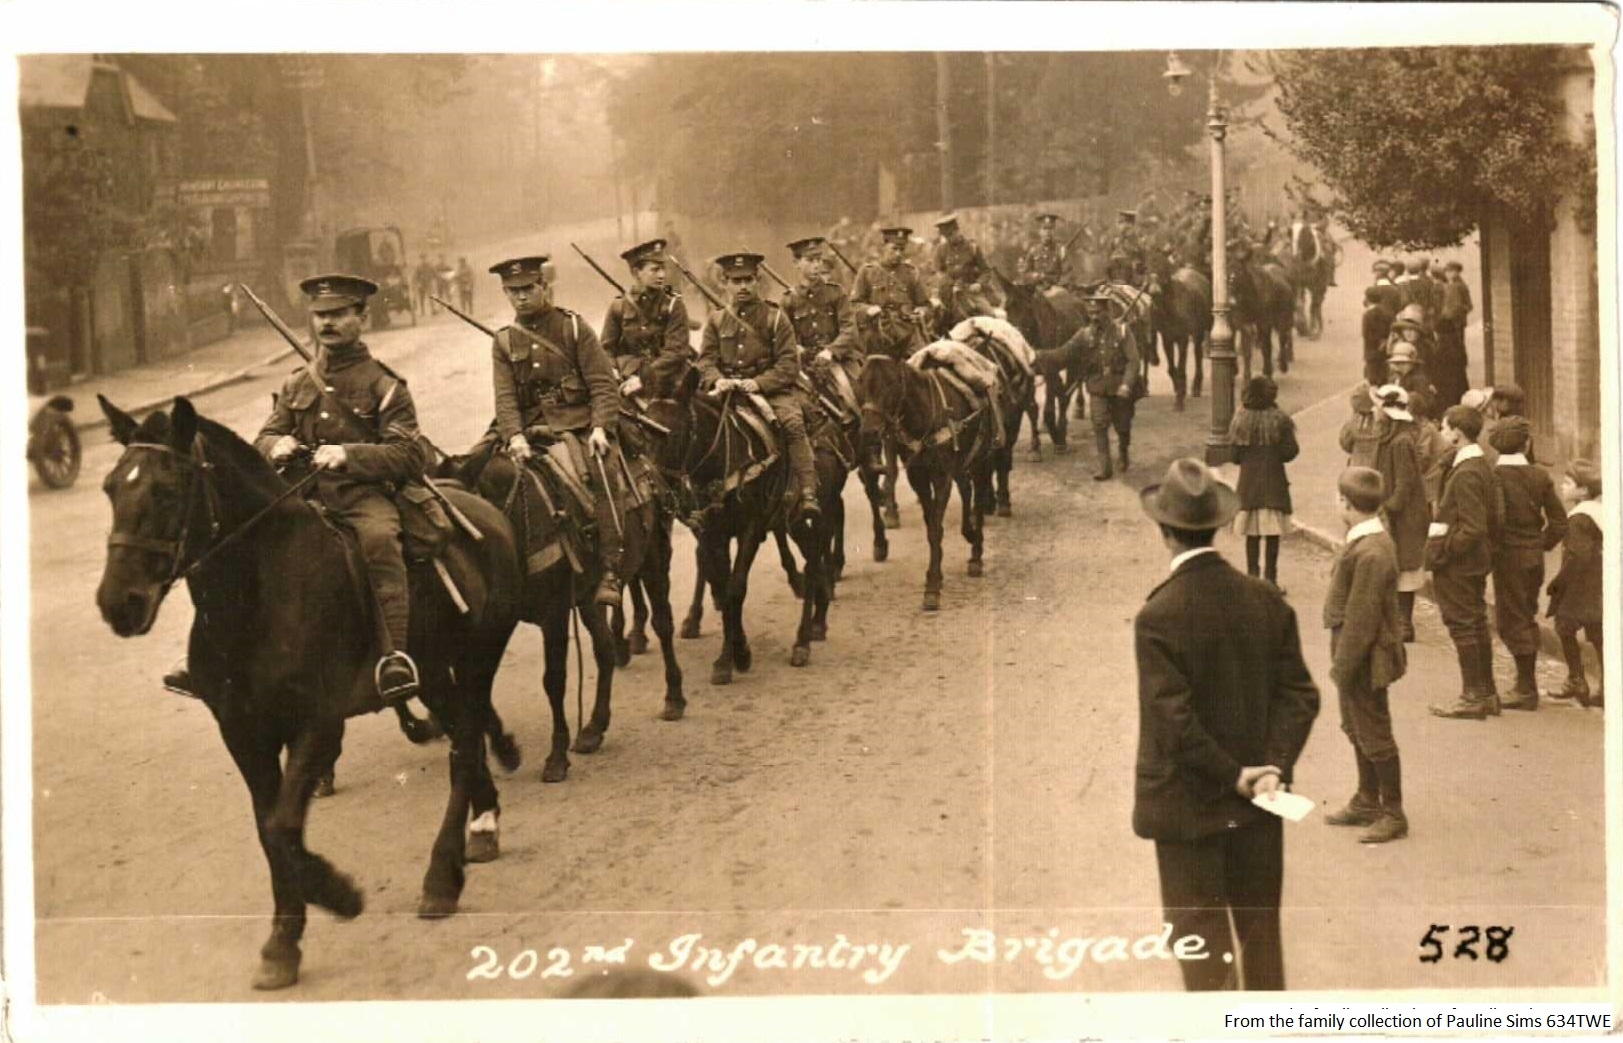 634twe-202nd-infantry-bridgade-528-front